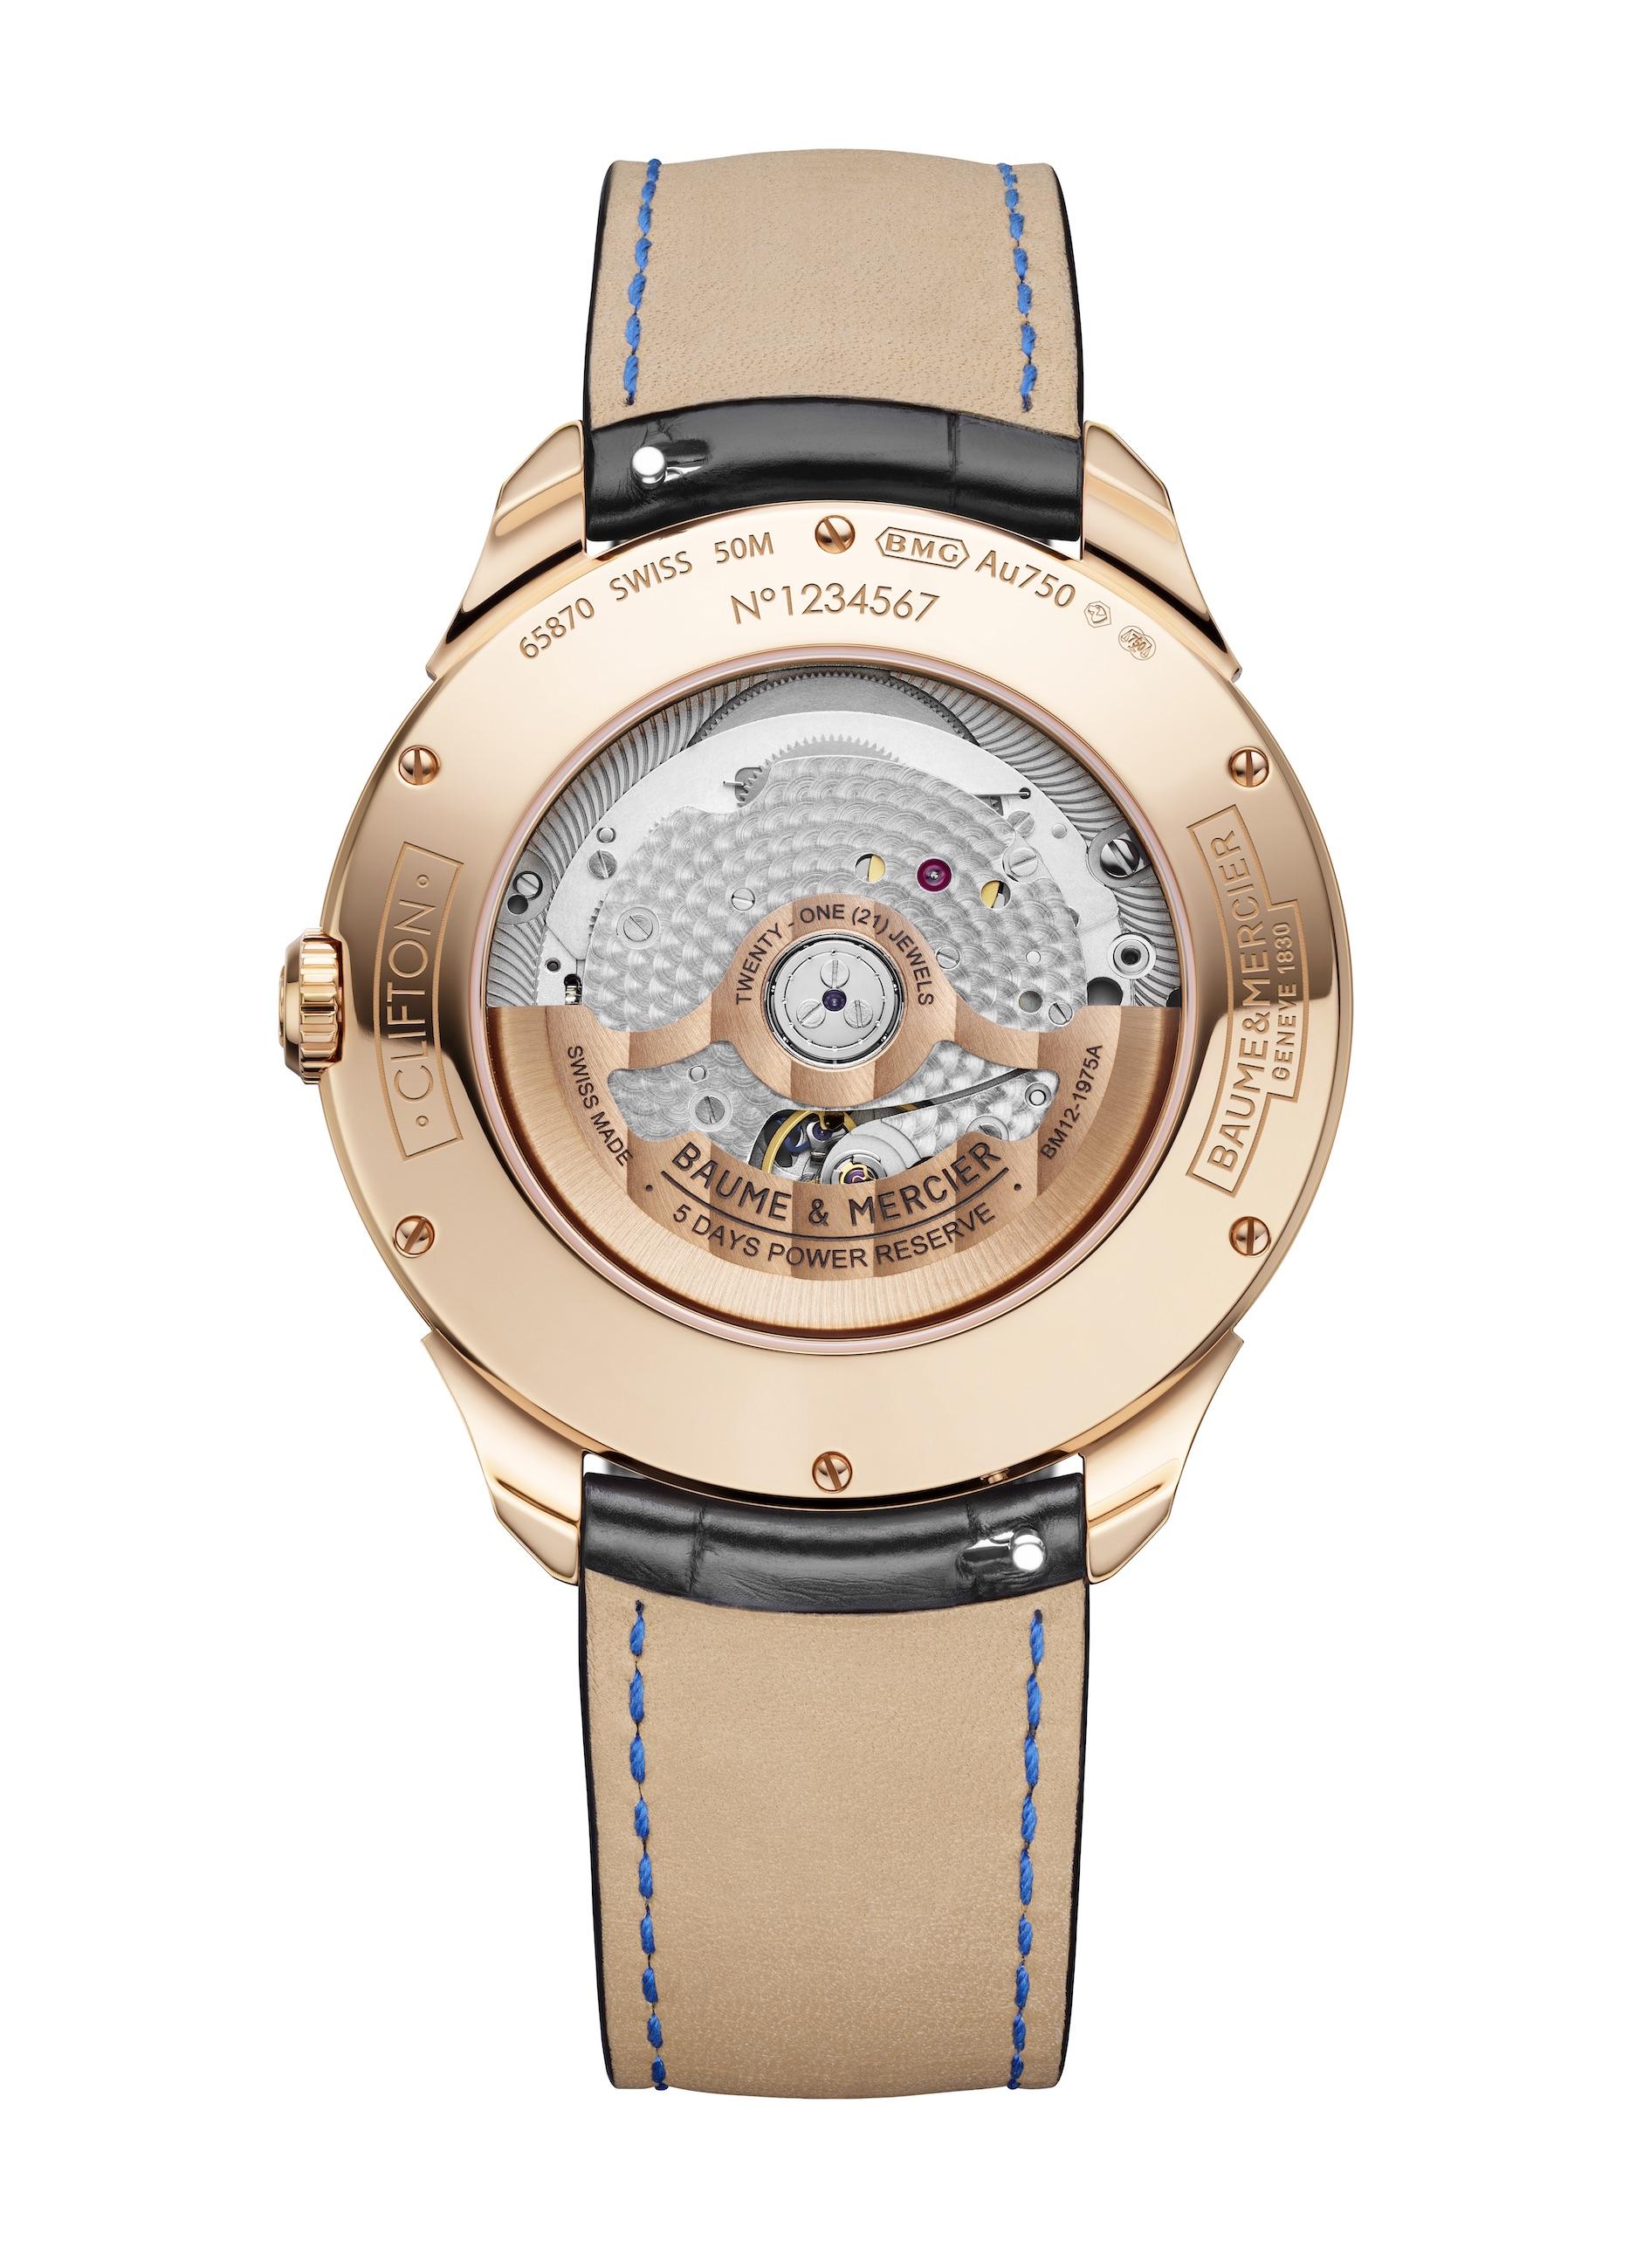 The Baume & Mercier Clifton Baumatic Perpetual Calendar watch joins the Baumatic BM13-1975AC-1 movement with a perpetual calendar module